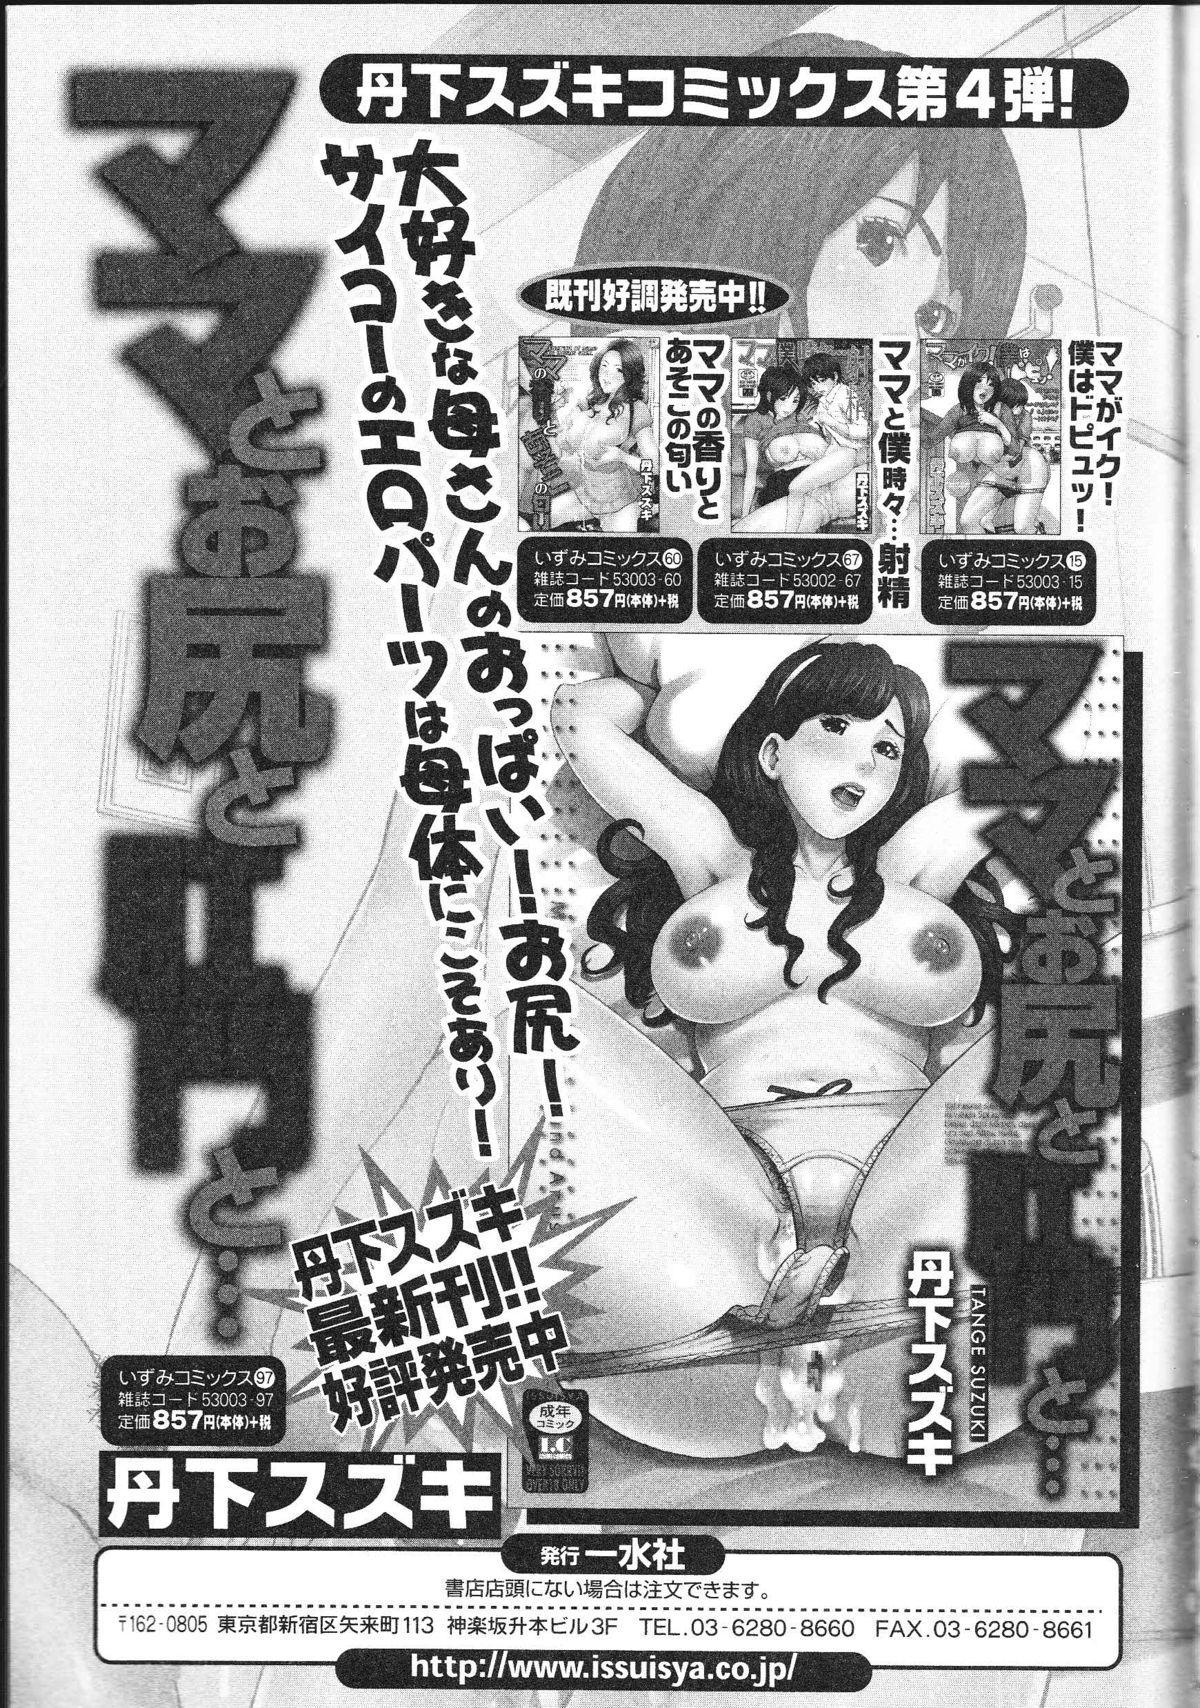 Nozoite wa Ikenai 9 - Do Not Peep! 9 161